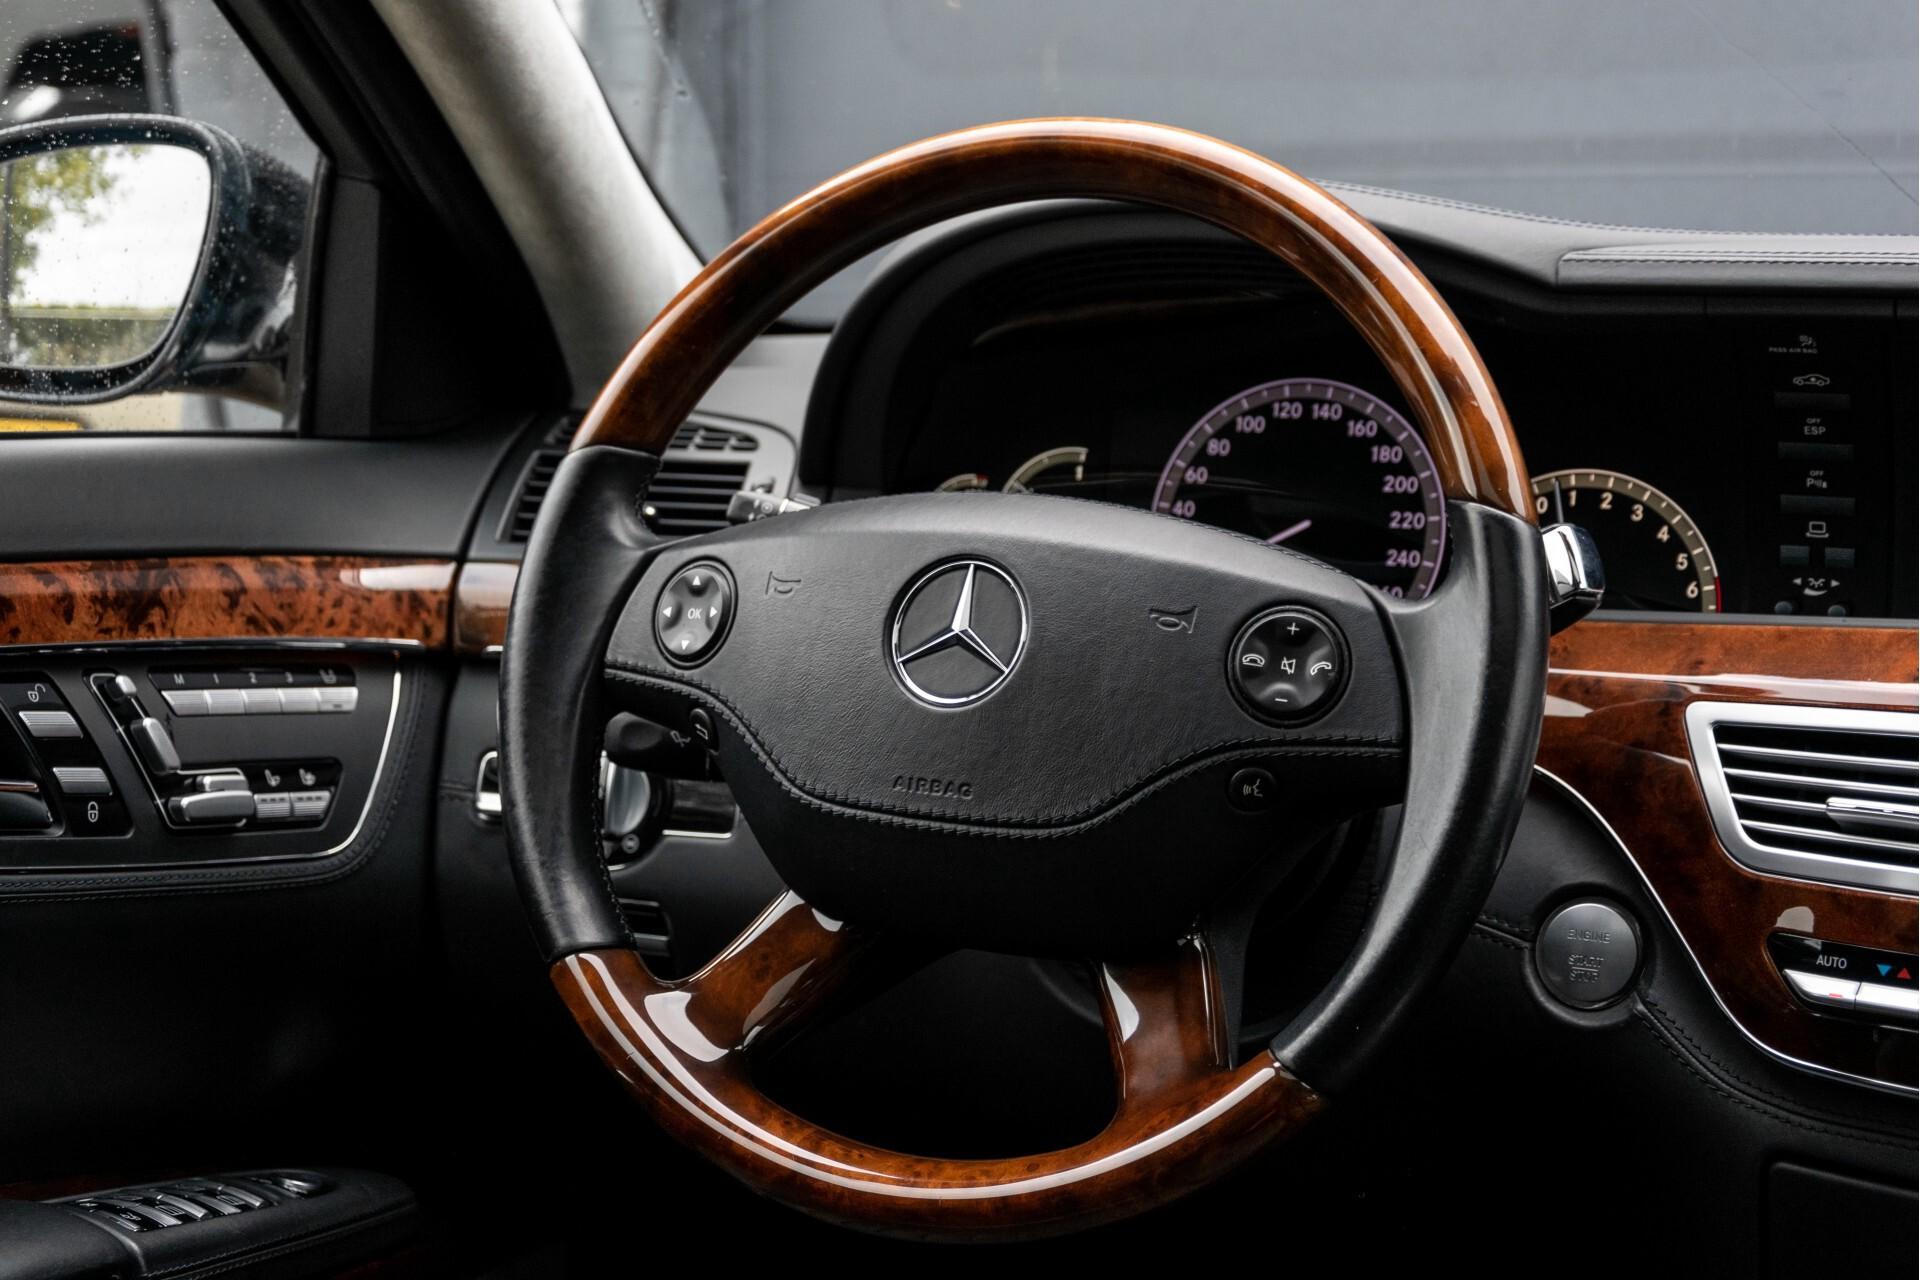 Mercedes-Benz S-Klasse 600 Lang 65 AMG Bi-Turbo Prestige Plus Aut5 Foto 8